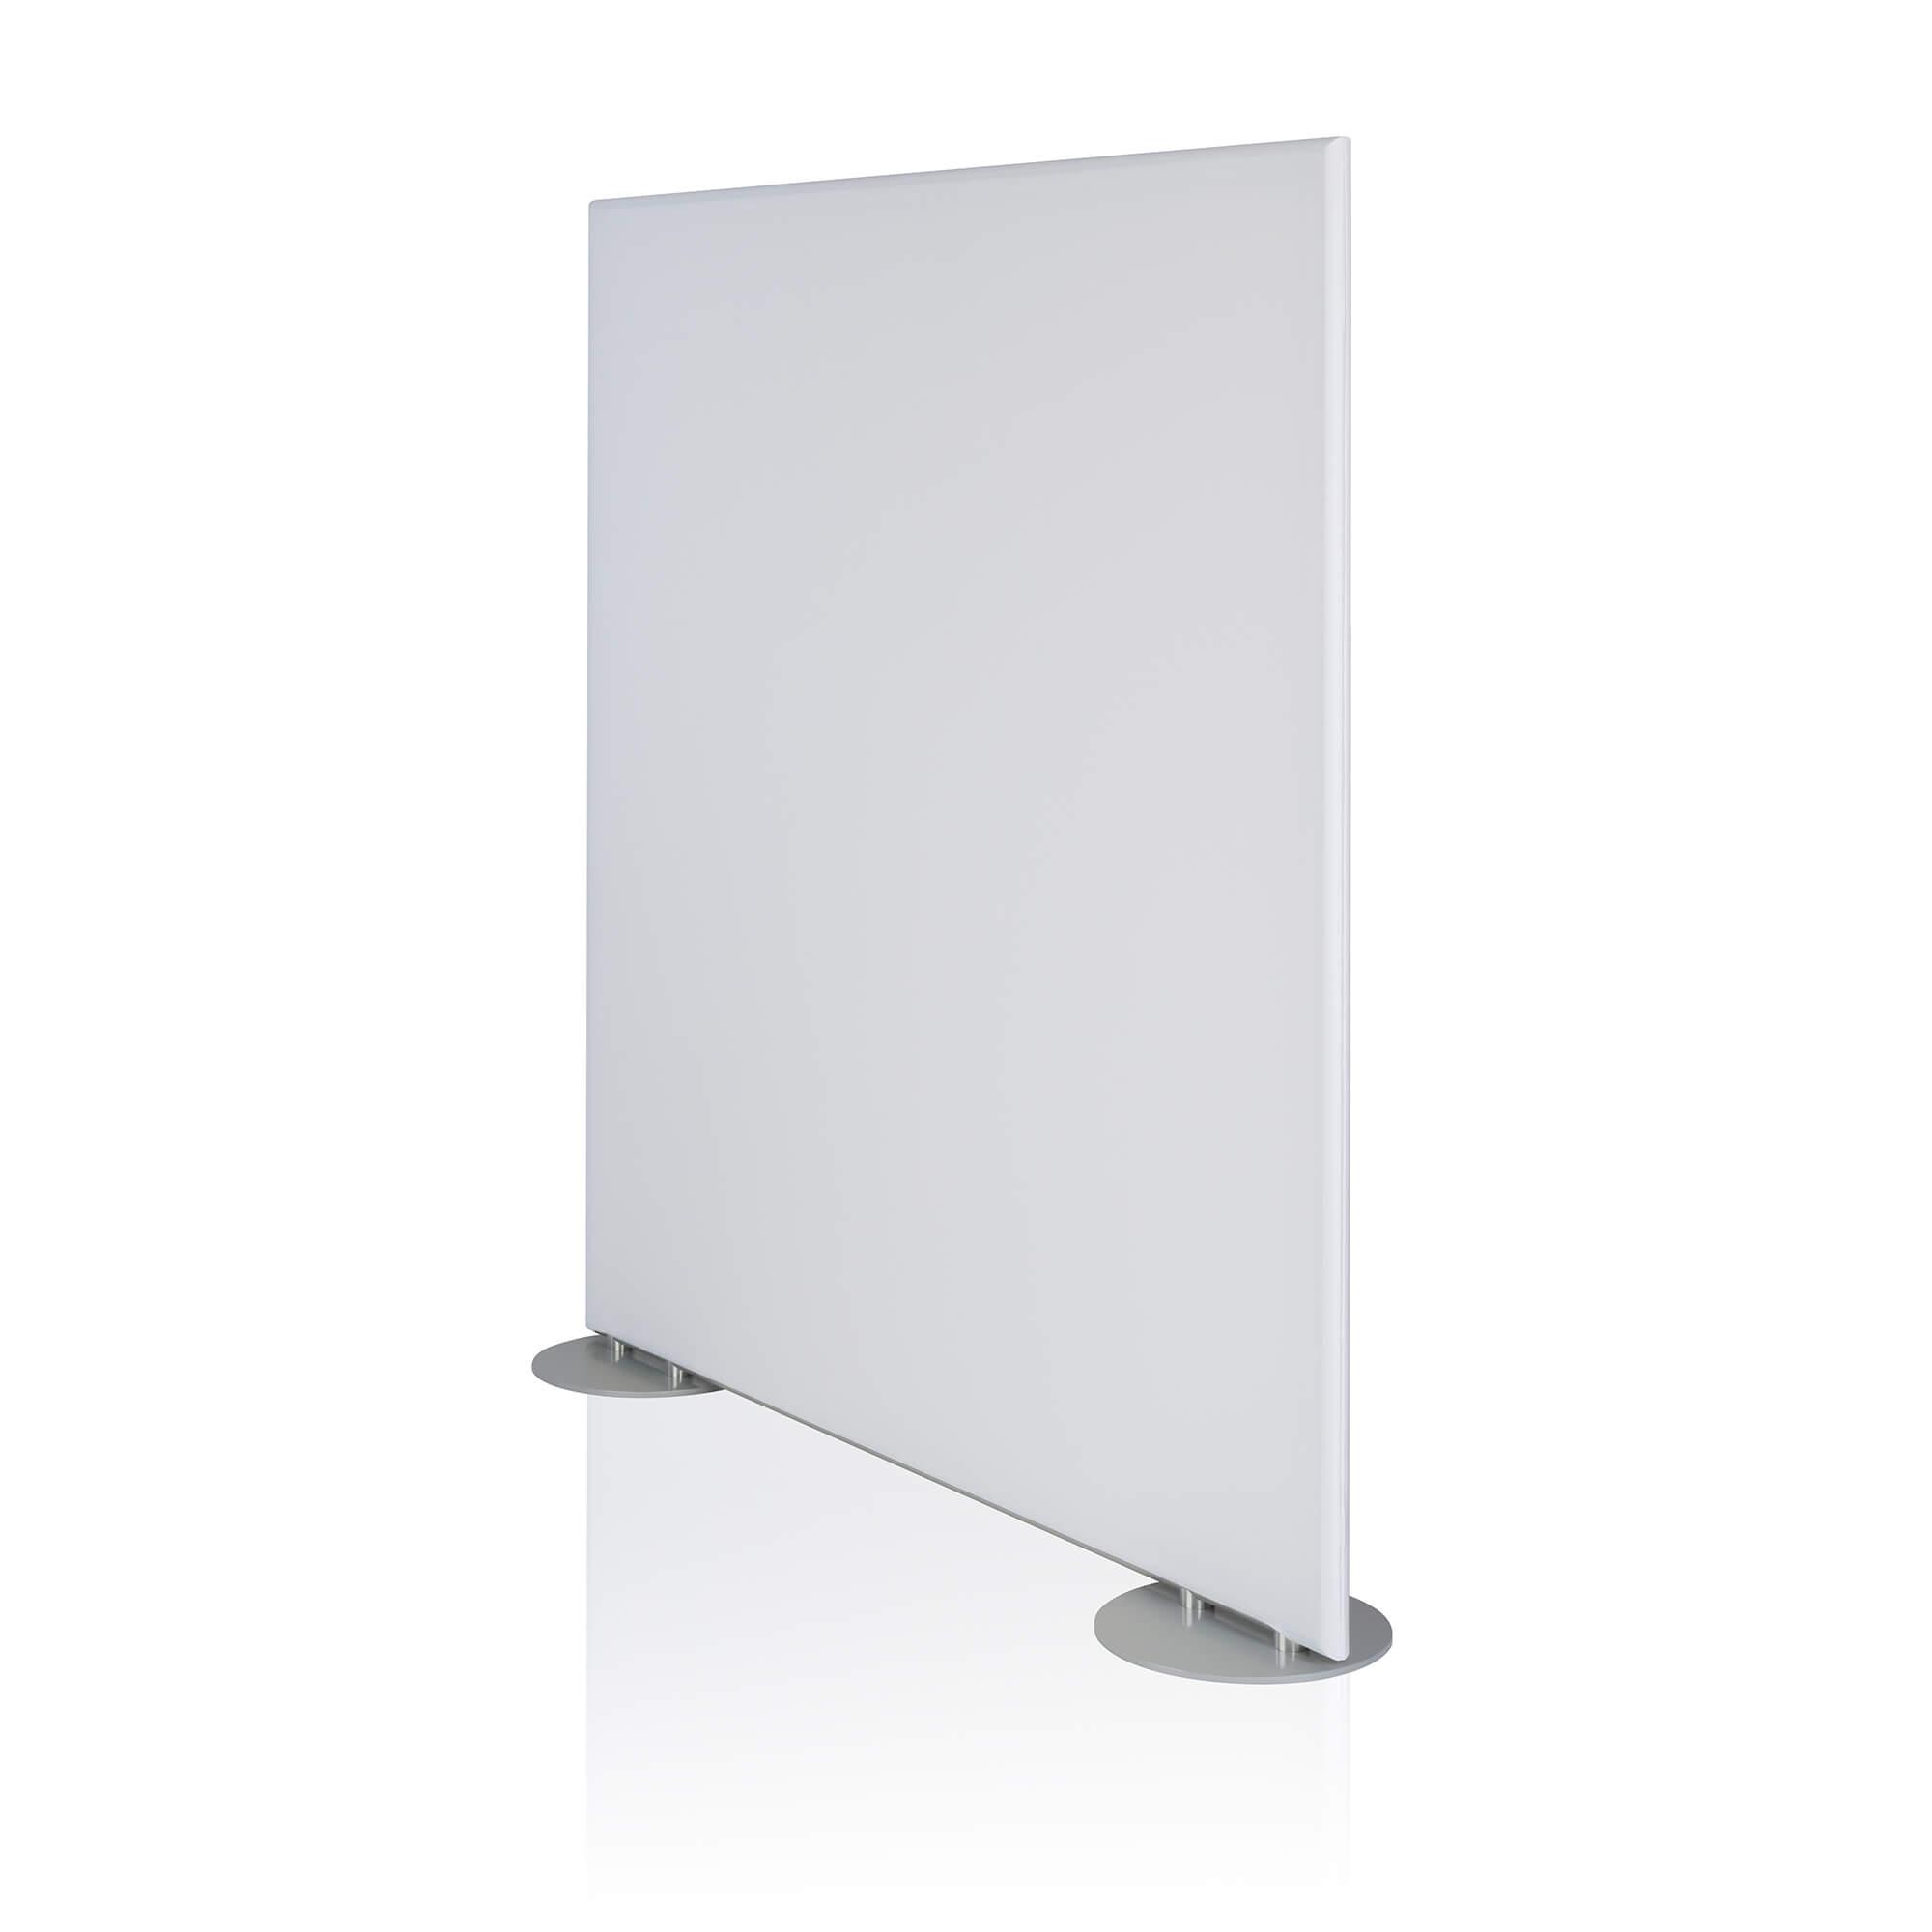 Akustik Raumteiler Trennwand Curve oder Line (SH050)